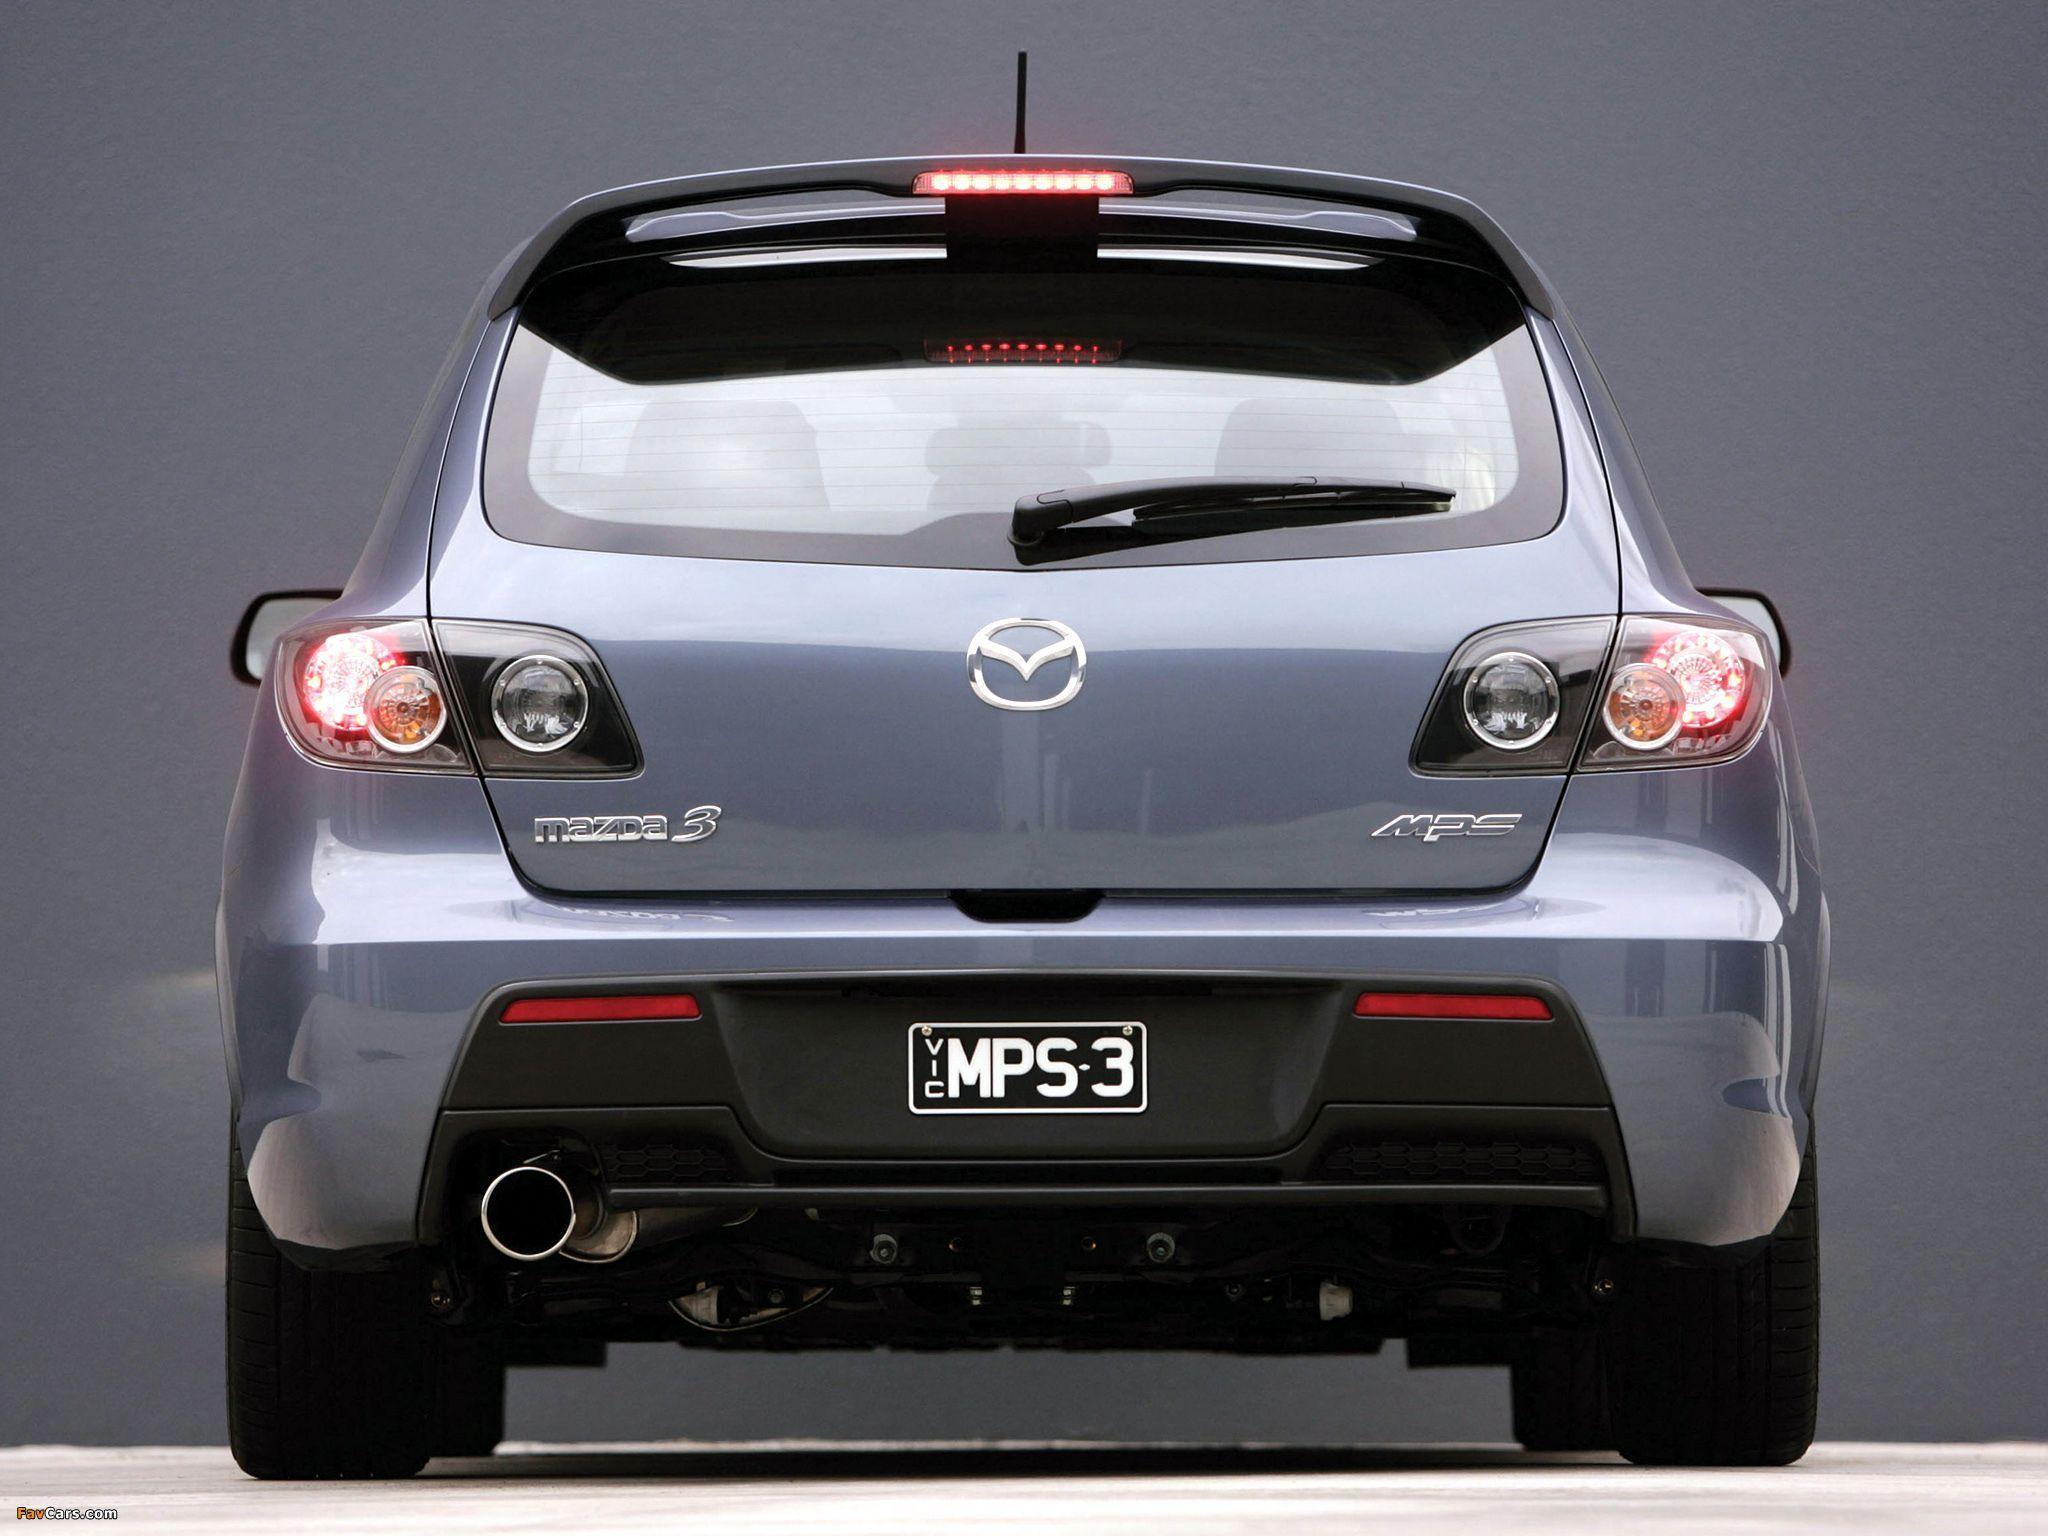 Mazdaspeed 3 Wallpapers - Wallpaper Cave